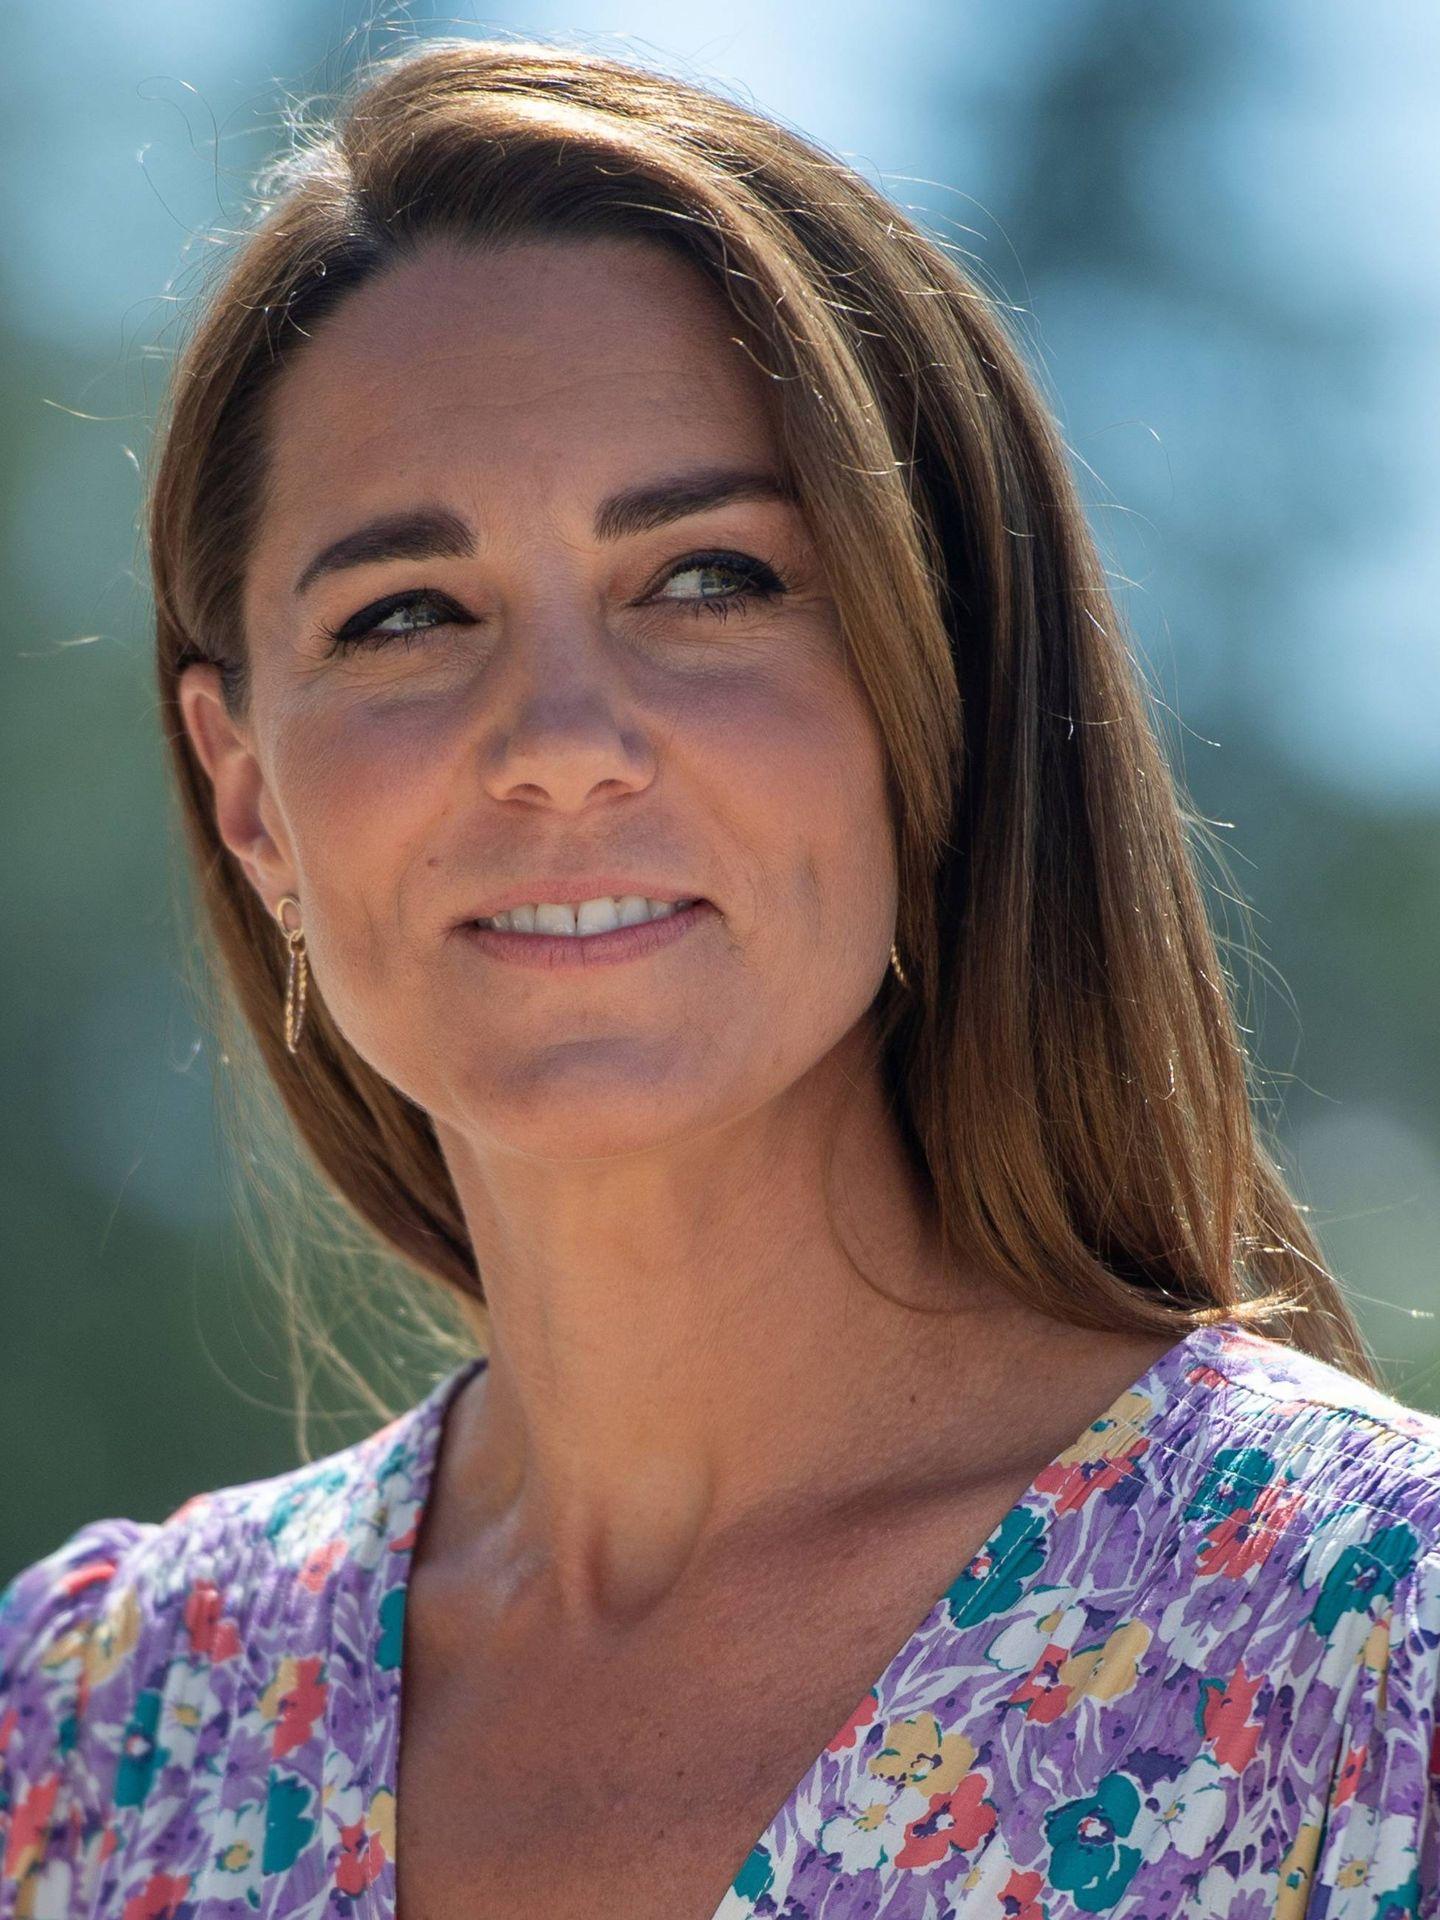 Detalle de las cejas de Kate Middleton en 2020. (Cordon Press)